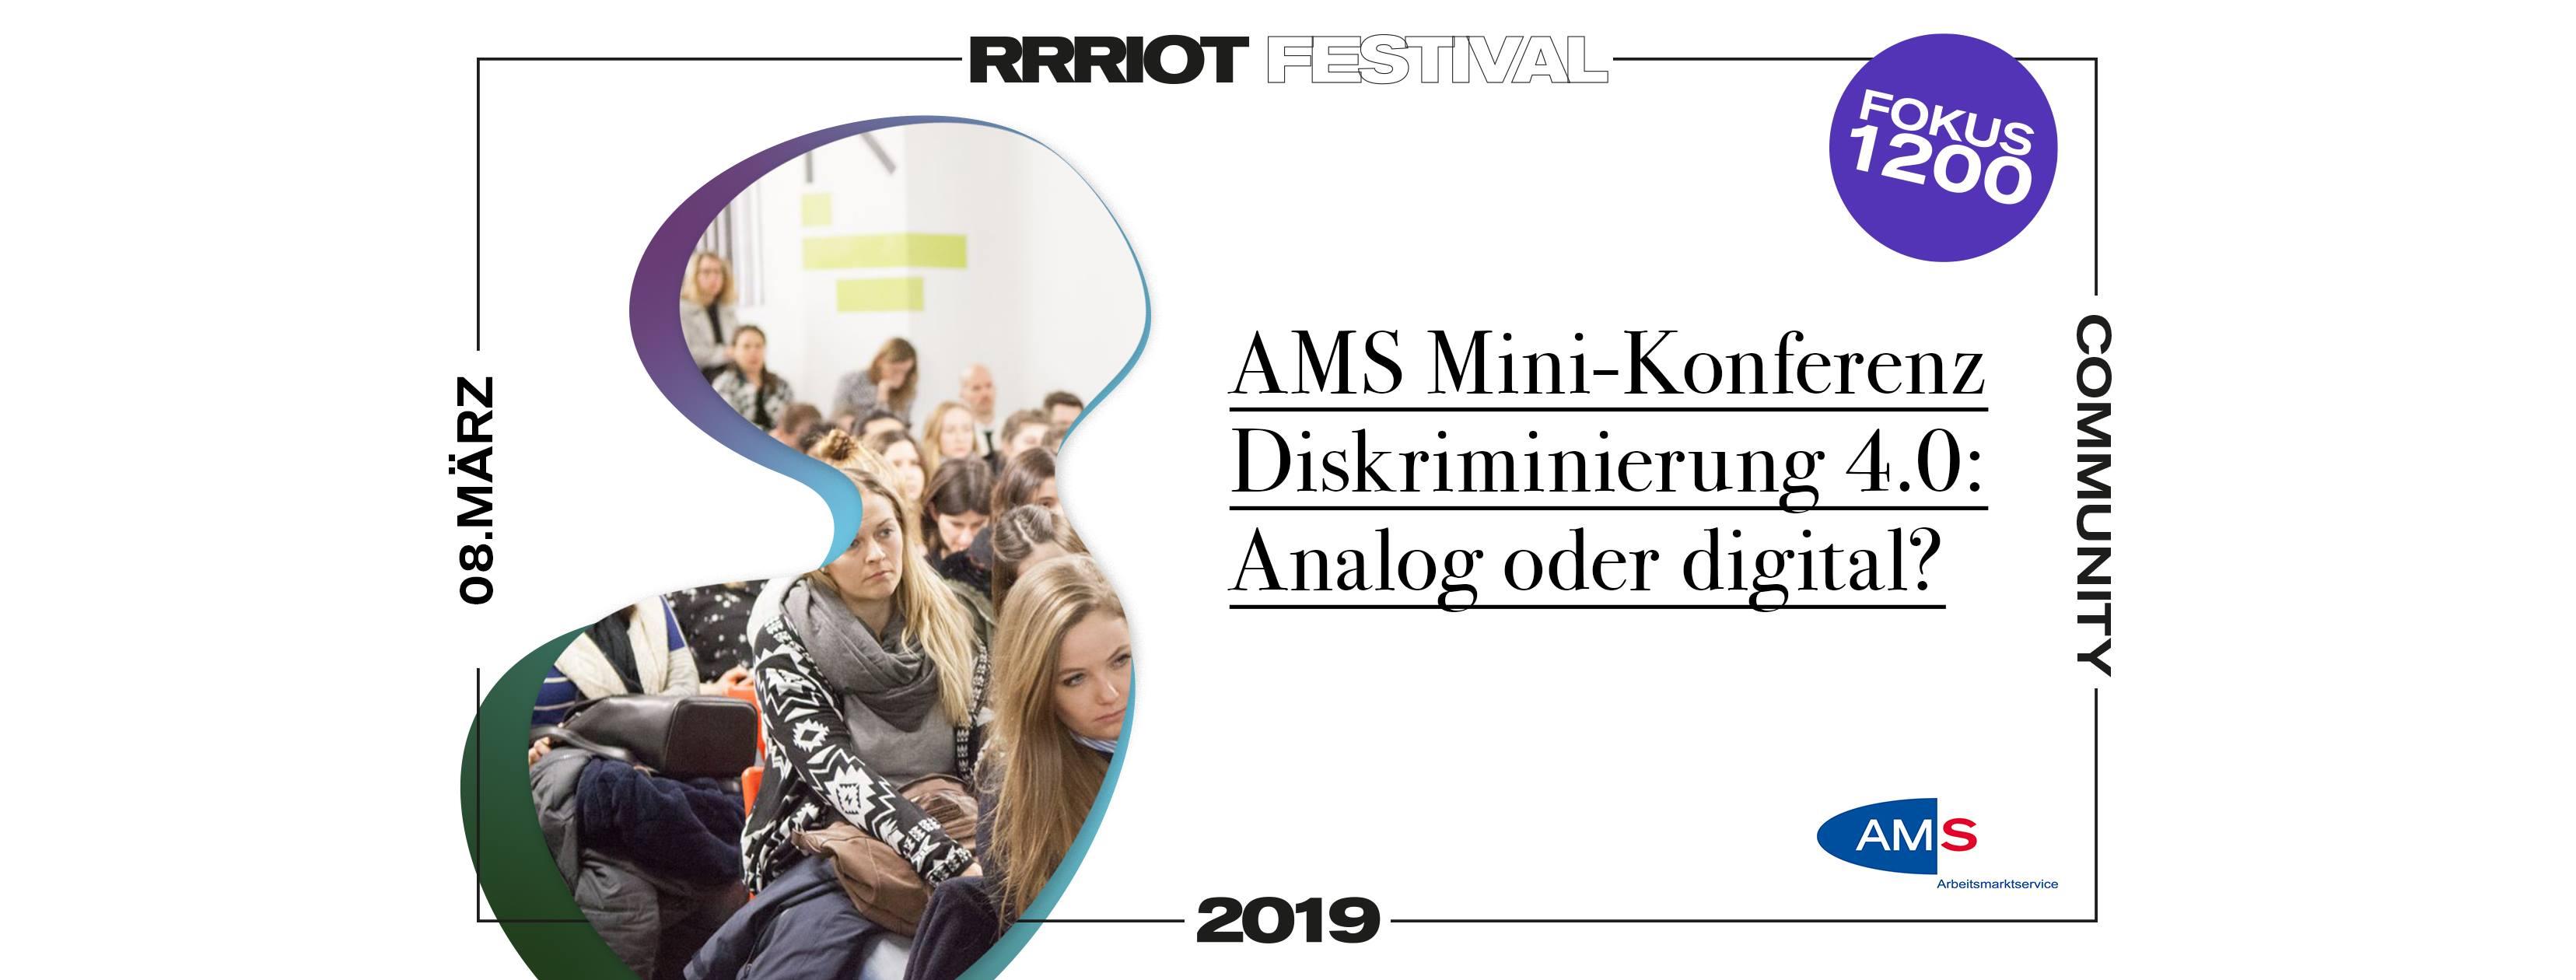 Rrriot Festival 2019 | AMS Mini Konferenz - 1200